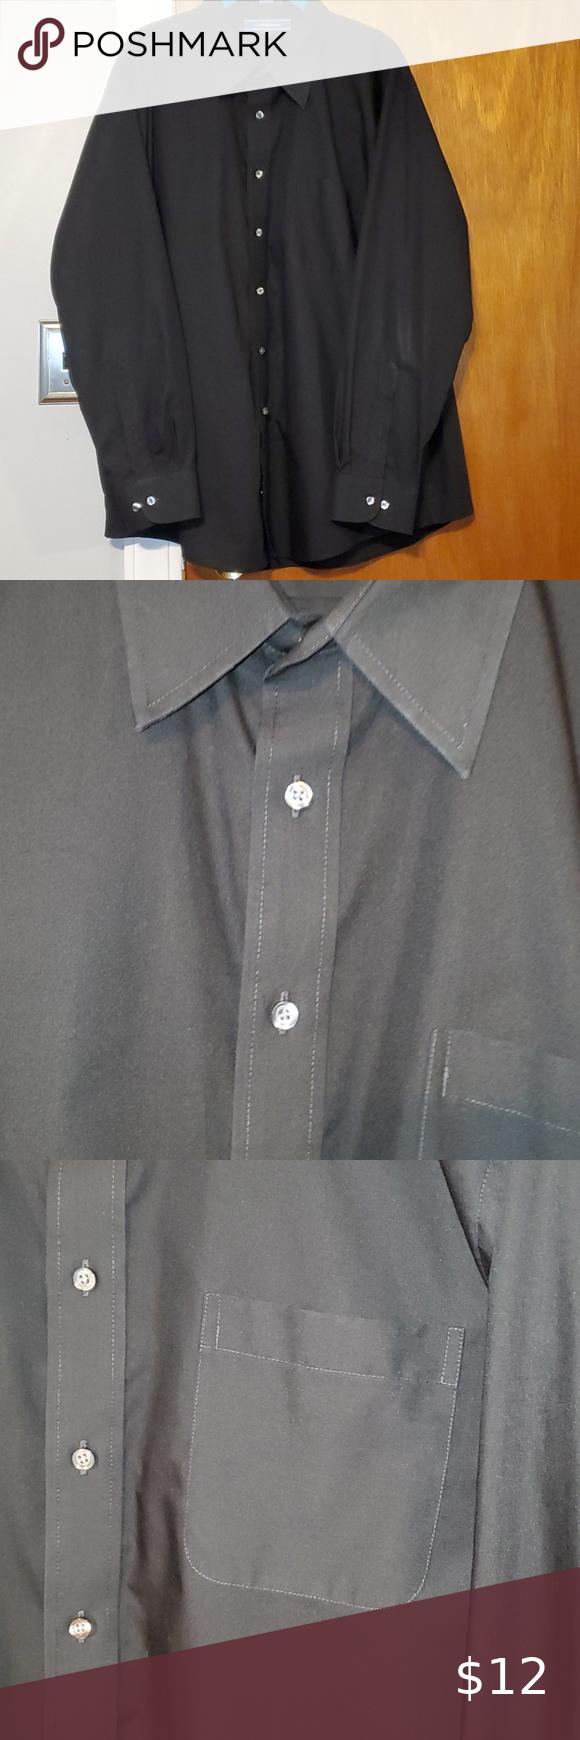 Men S Croft Barrow Black Dress Shirt 18 34 35 In 2020 Black Shirt Dress Mens Shirt Dress Shirts [ 1740 x 580 Pixel ]